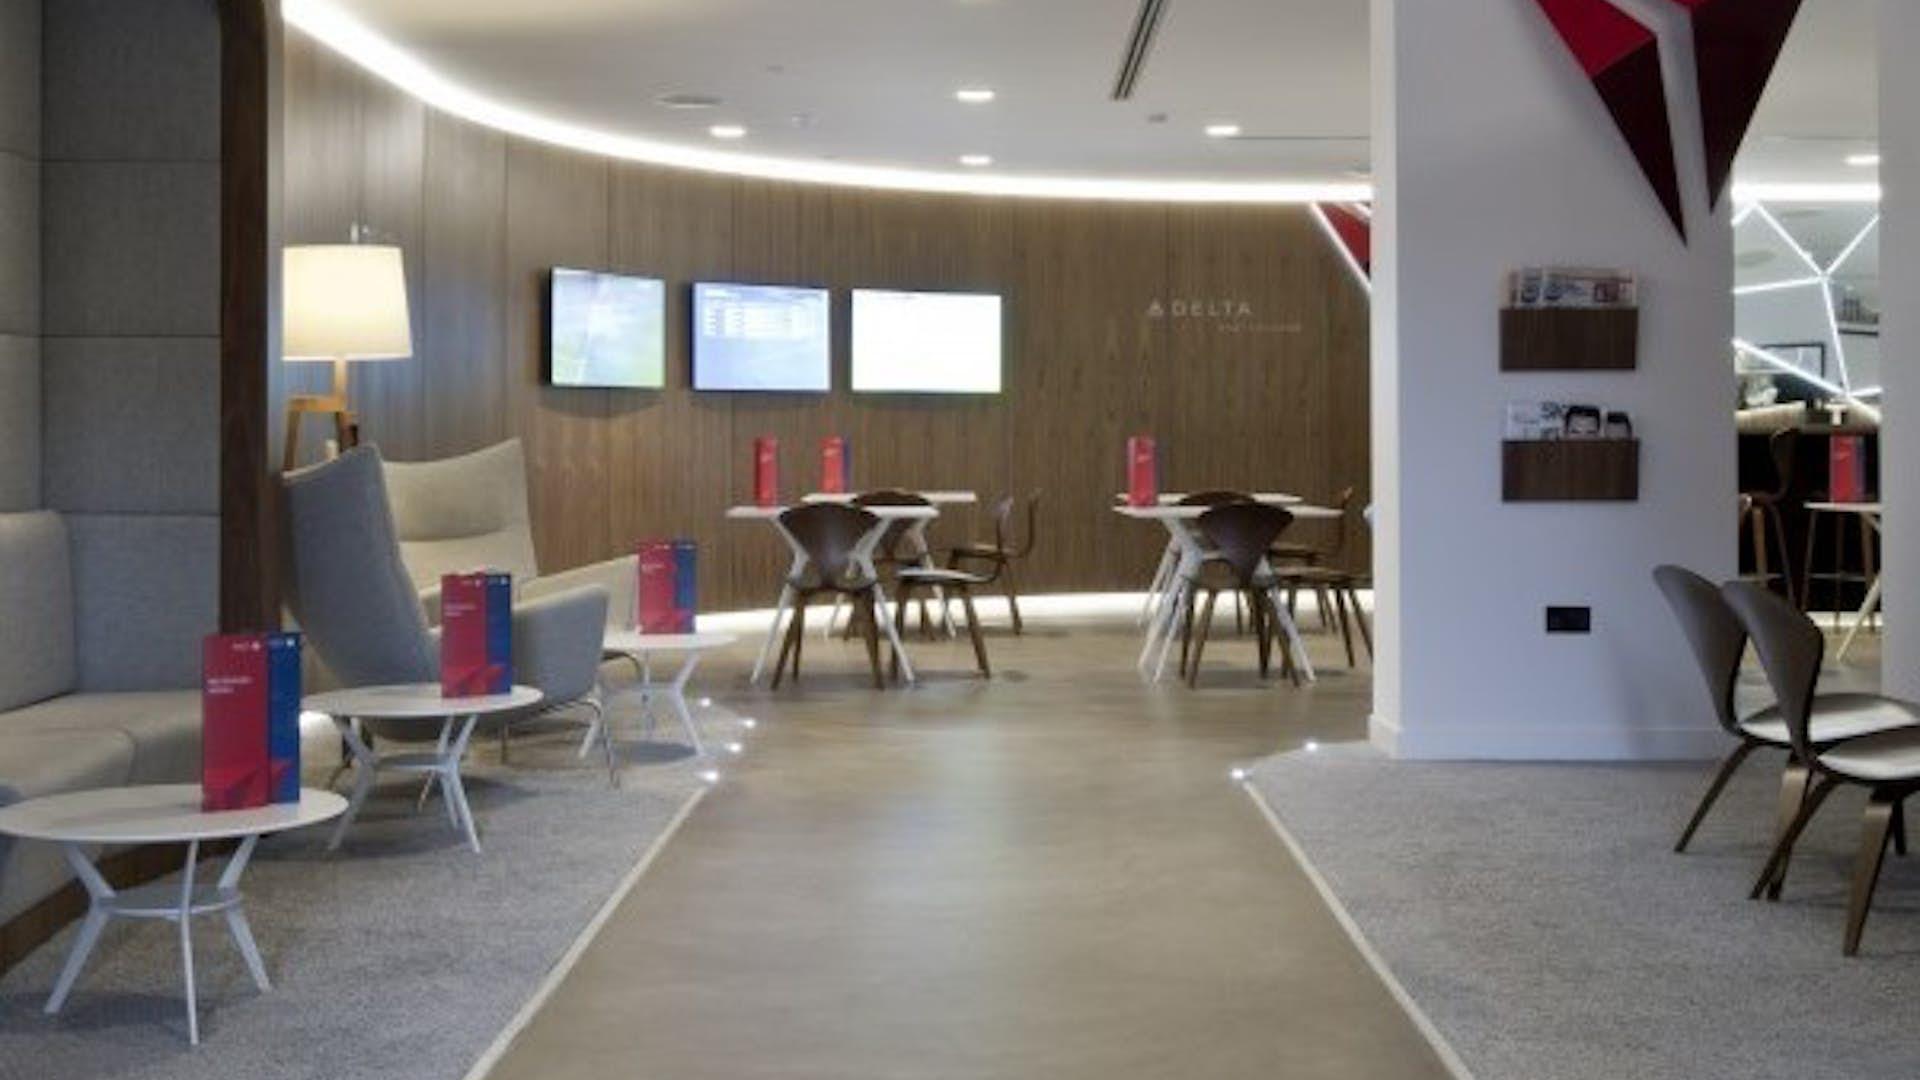 Hire E Venue The Delta Lounge At Millennium Copthorne Hotel Chelsea Fc